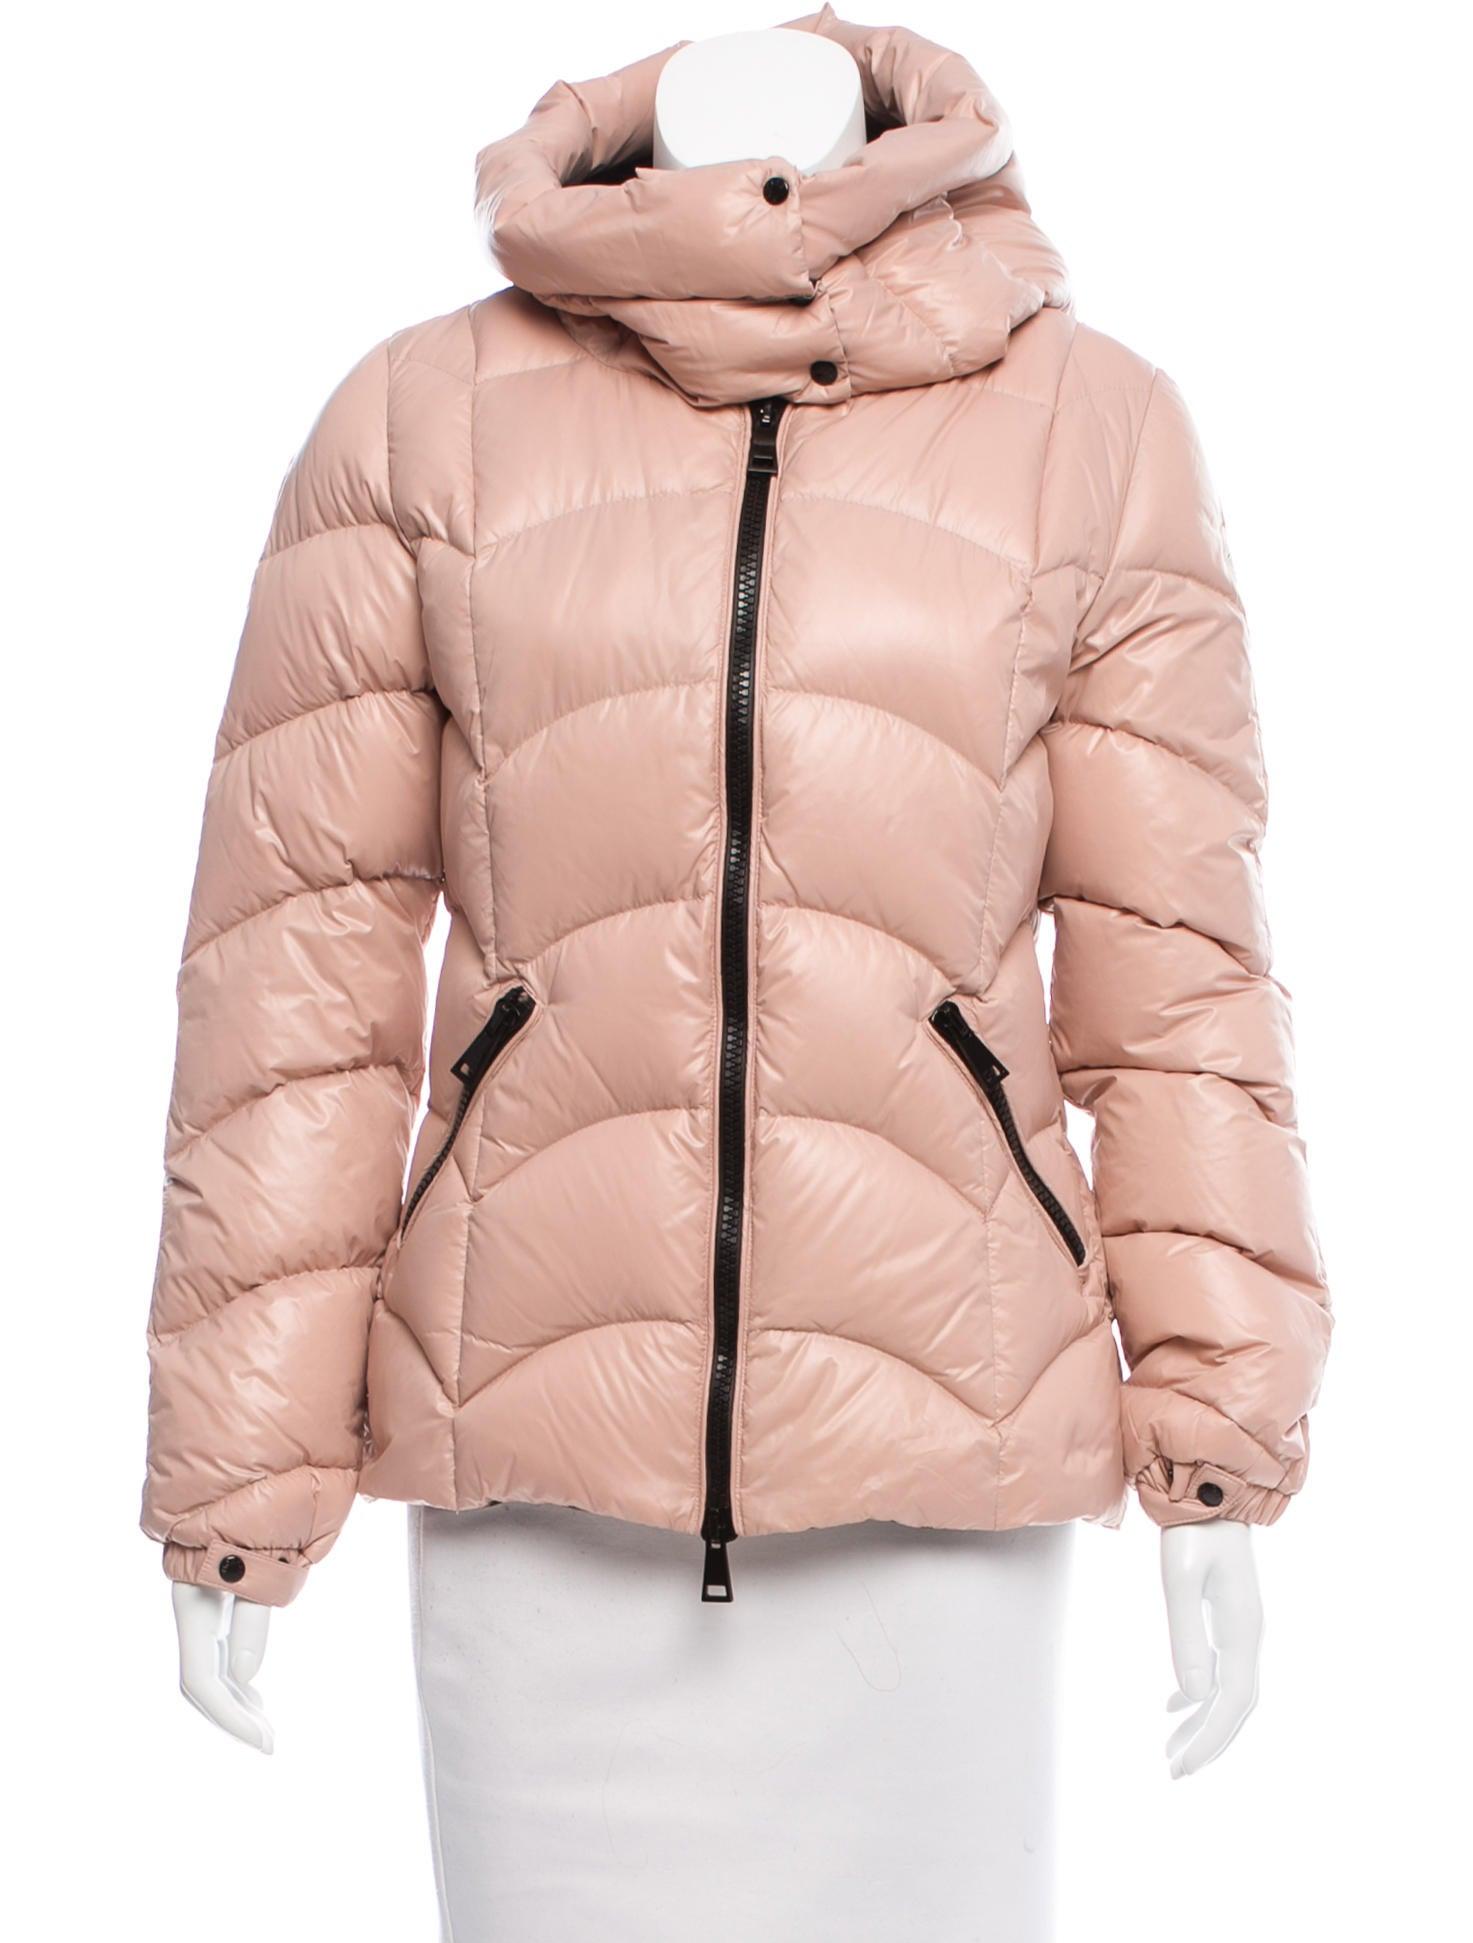 b7de8d425 Moncler Akebia Hooded Wave Puffer Coat - Clothing - MOC28495